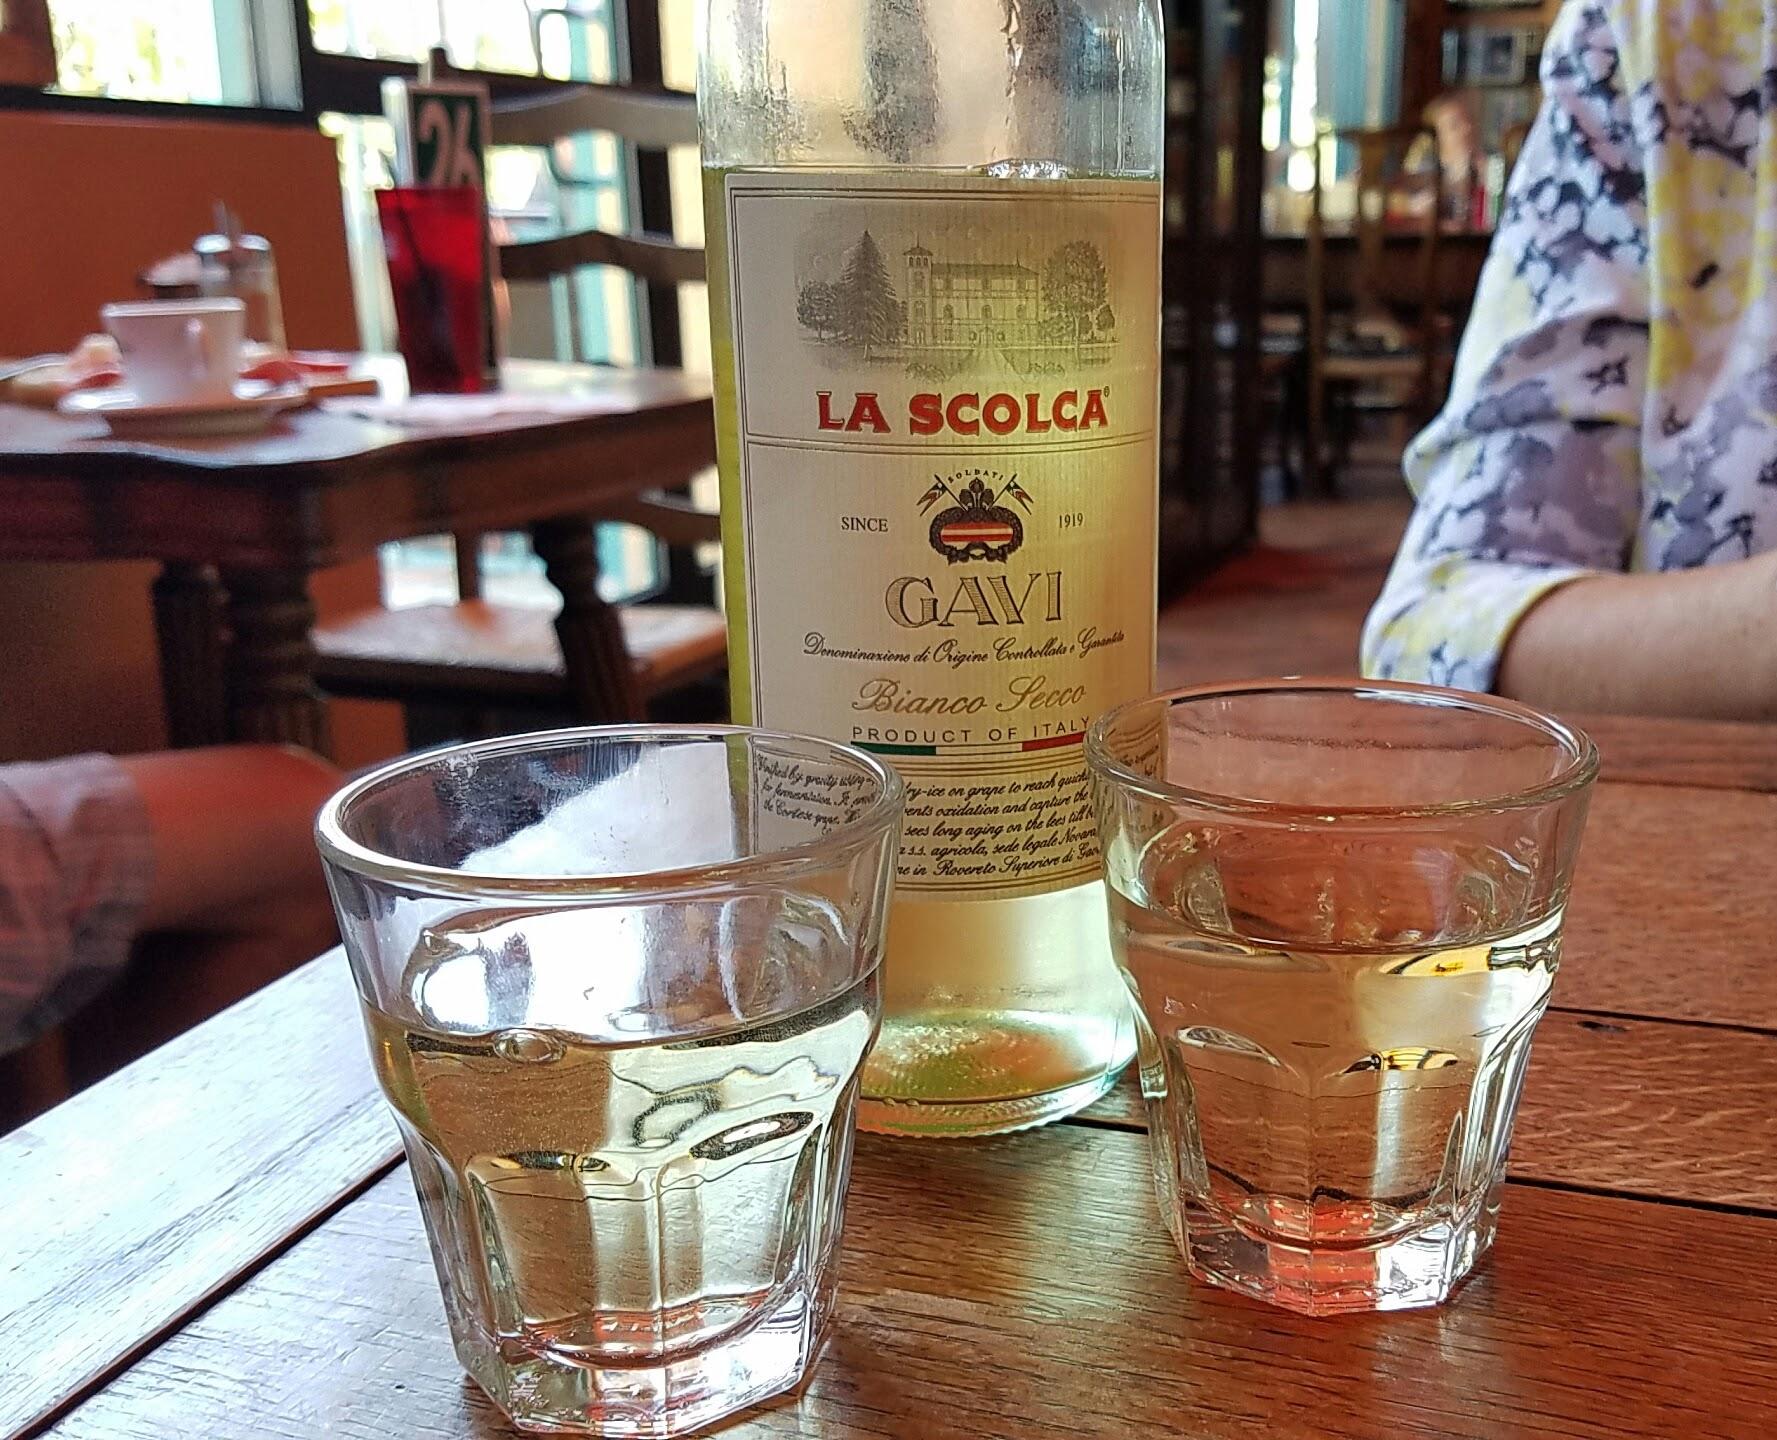 A bottle of La Scolca Gavi to share